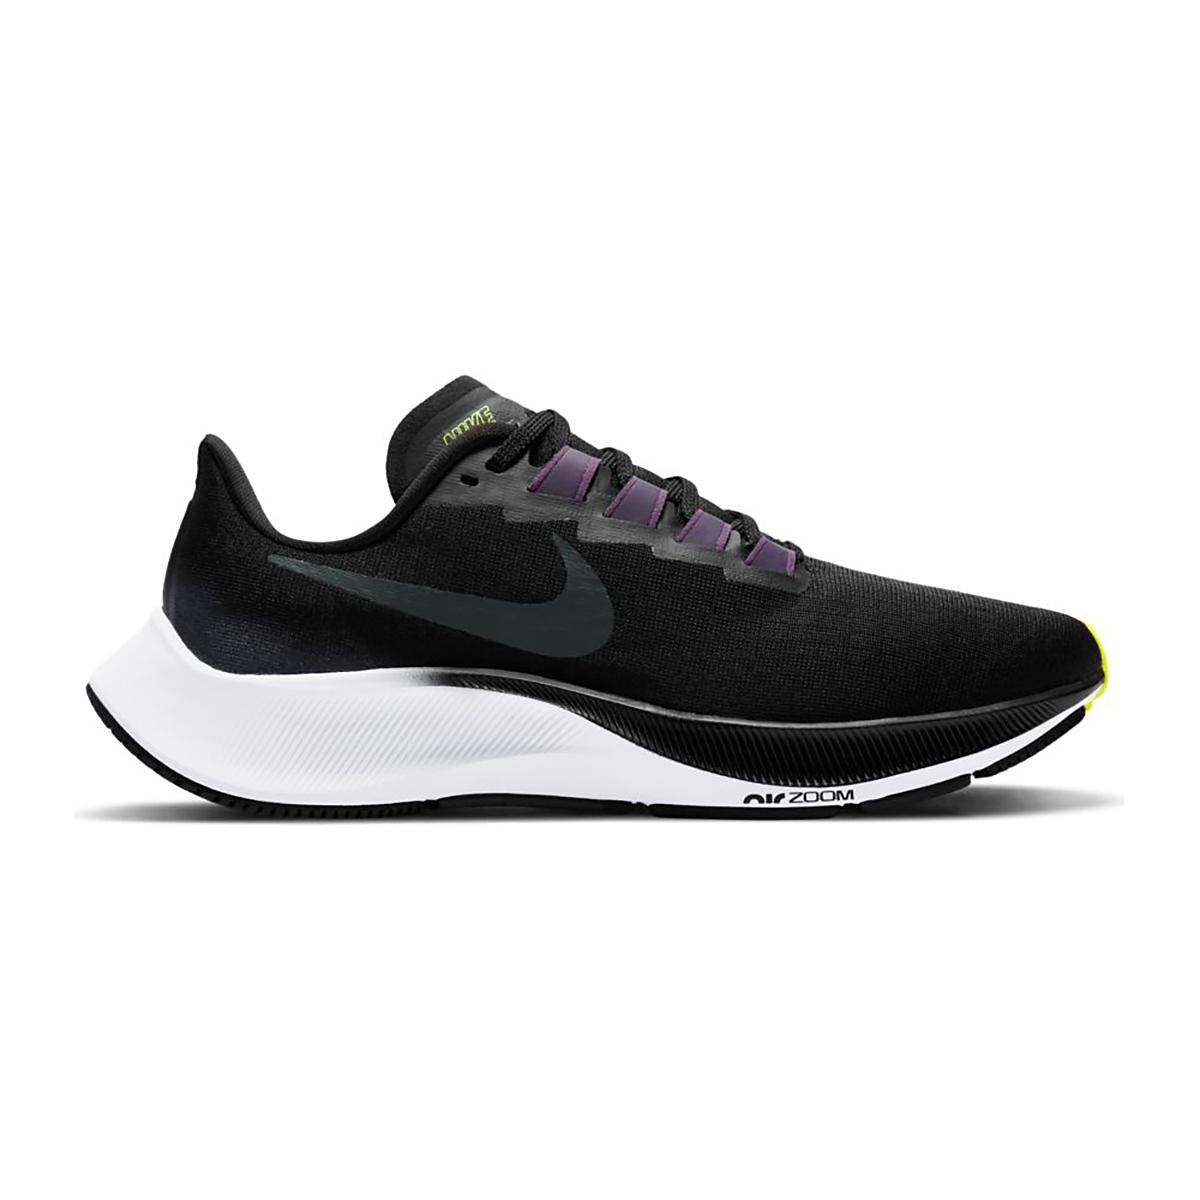 Women's Nike Nike Air Zoom Pegasus 37 Running Shoe - Color: Black/Anthracite/Dark Raisin/White - Size: 5 - Width: Regular, Black/Anthracite/Dark Raisin/White, large, image 1